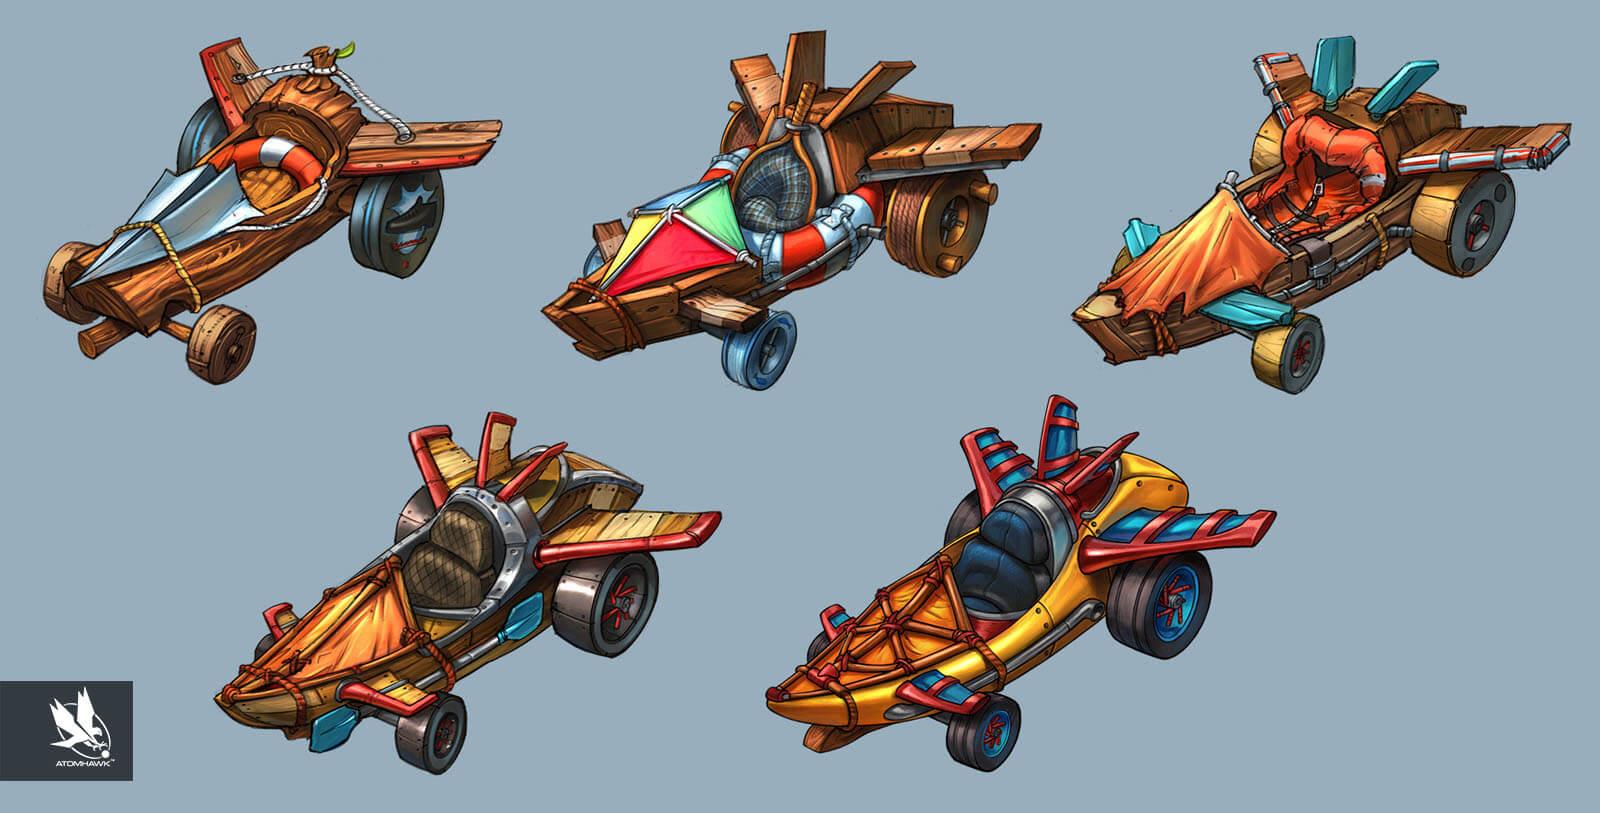 Atomhawk_Exient Rovio_Angry Birds Go_Marketing Art_Product Design_Go Karts_Services.jpg